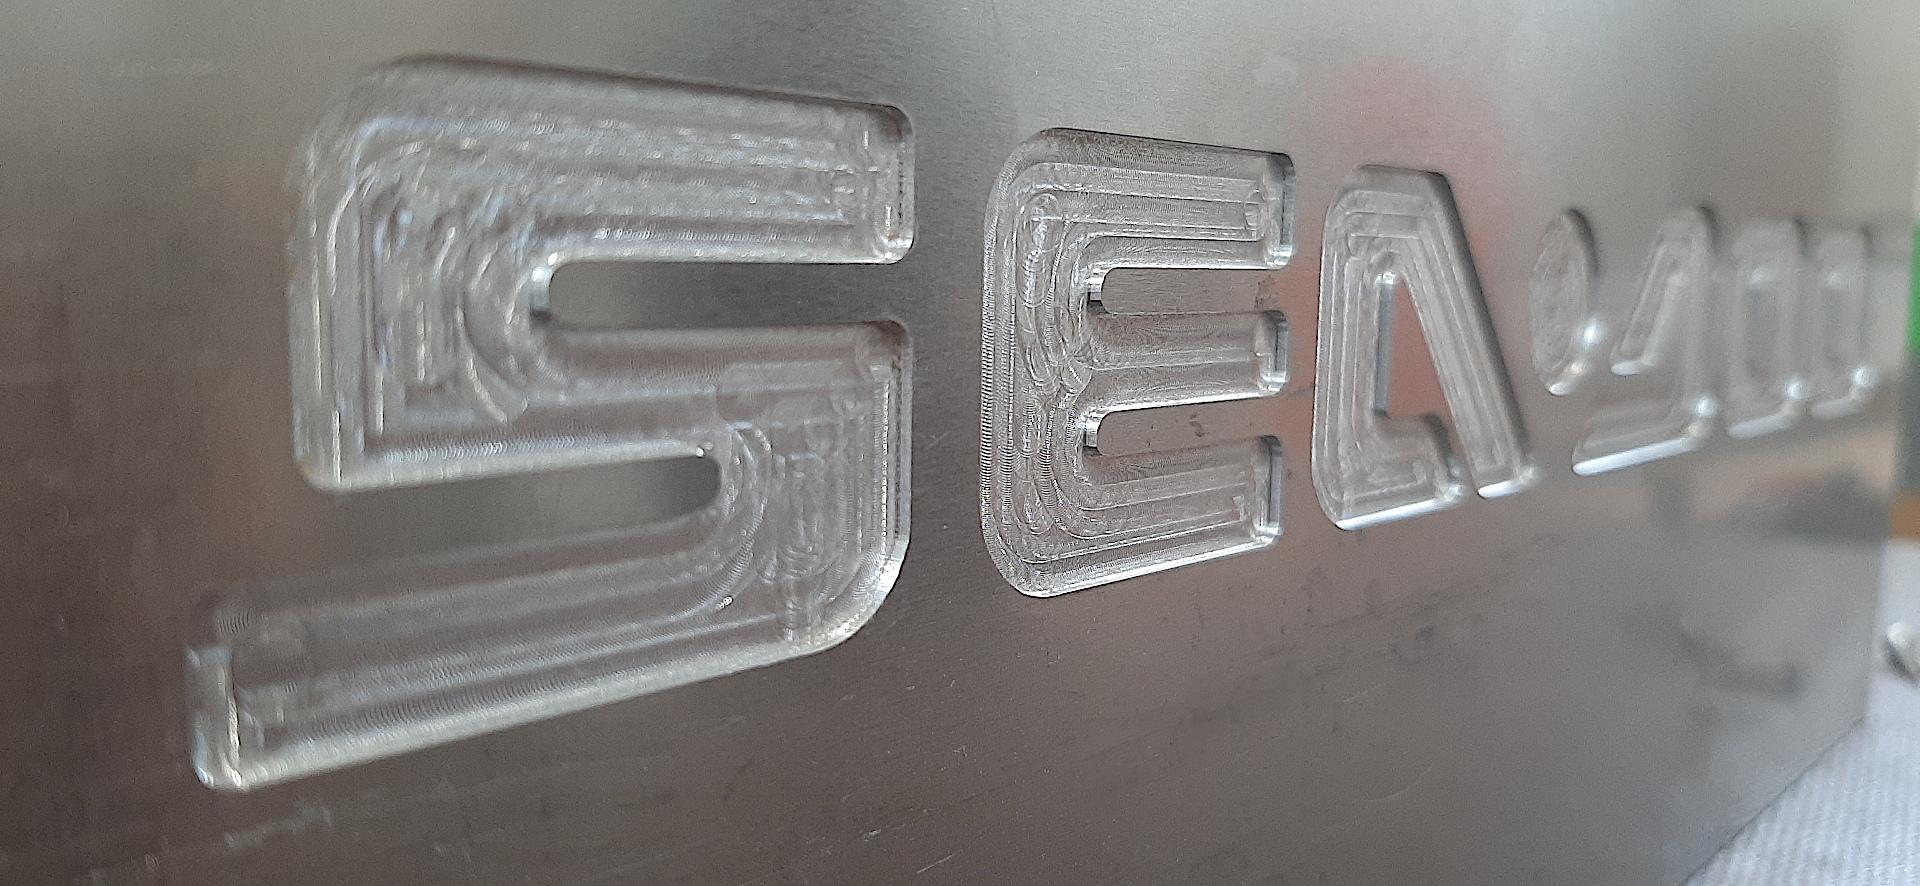 Blacha aluminiowa frezowany napis litery cyfry